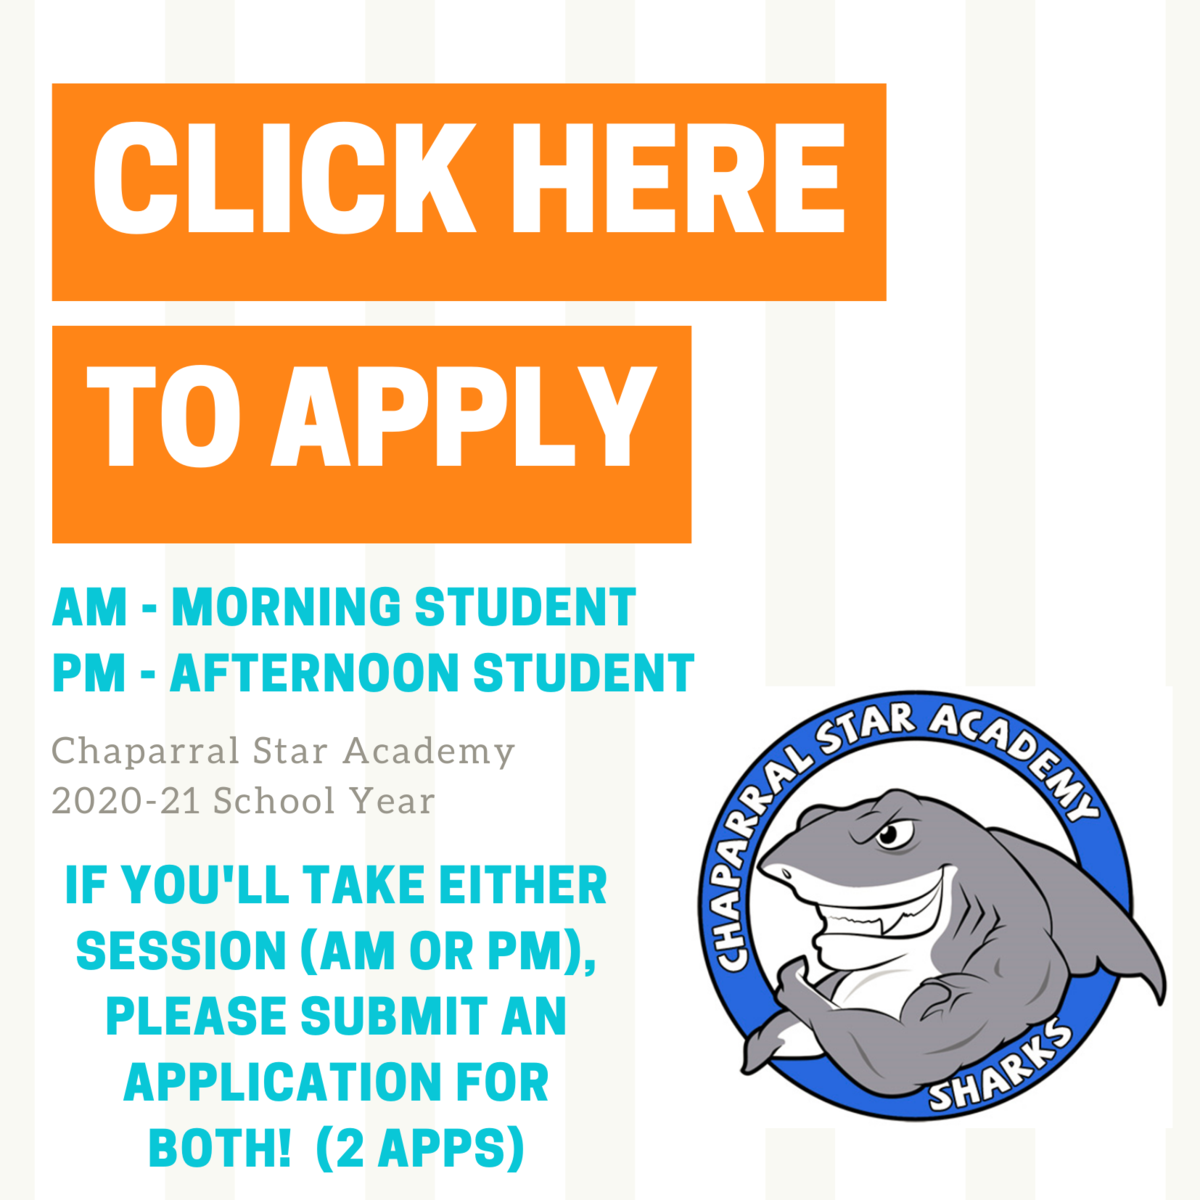 Apply here logo